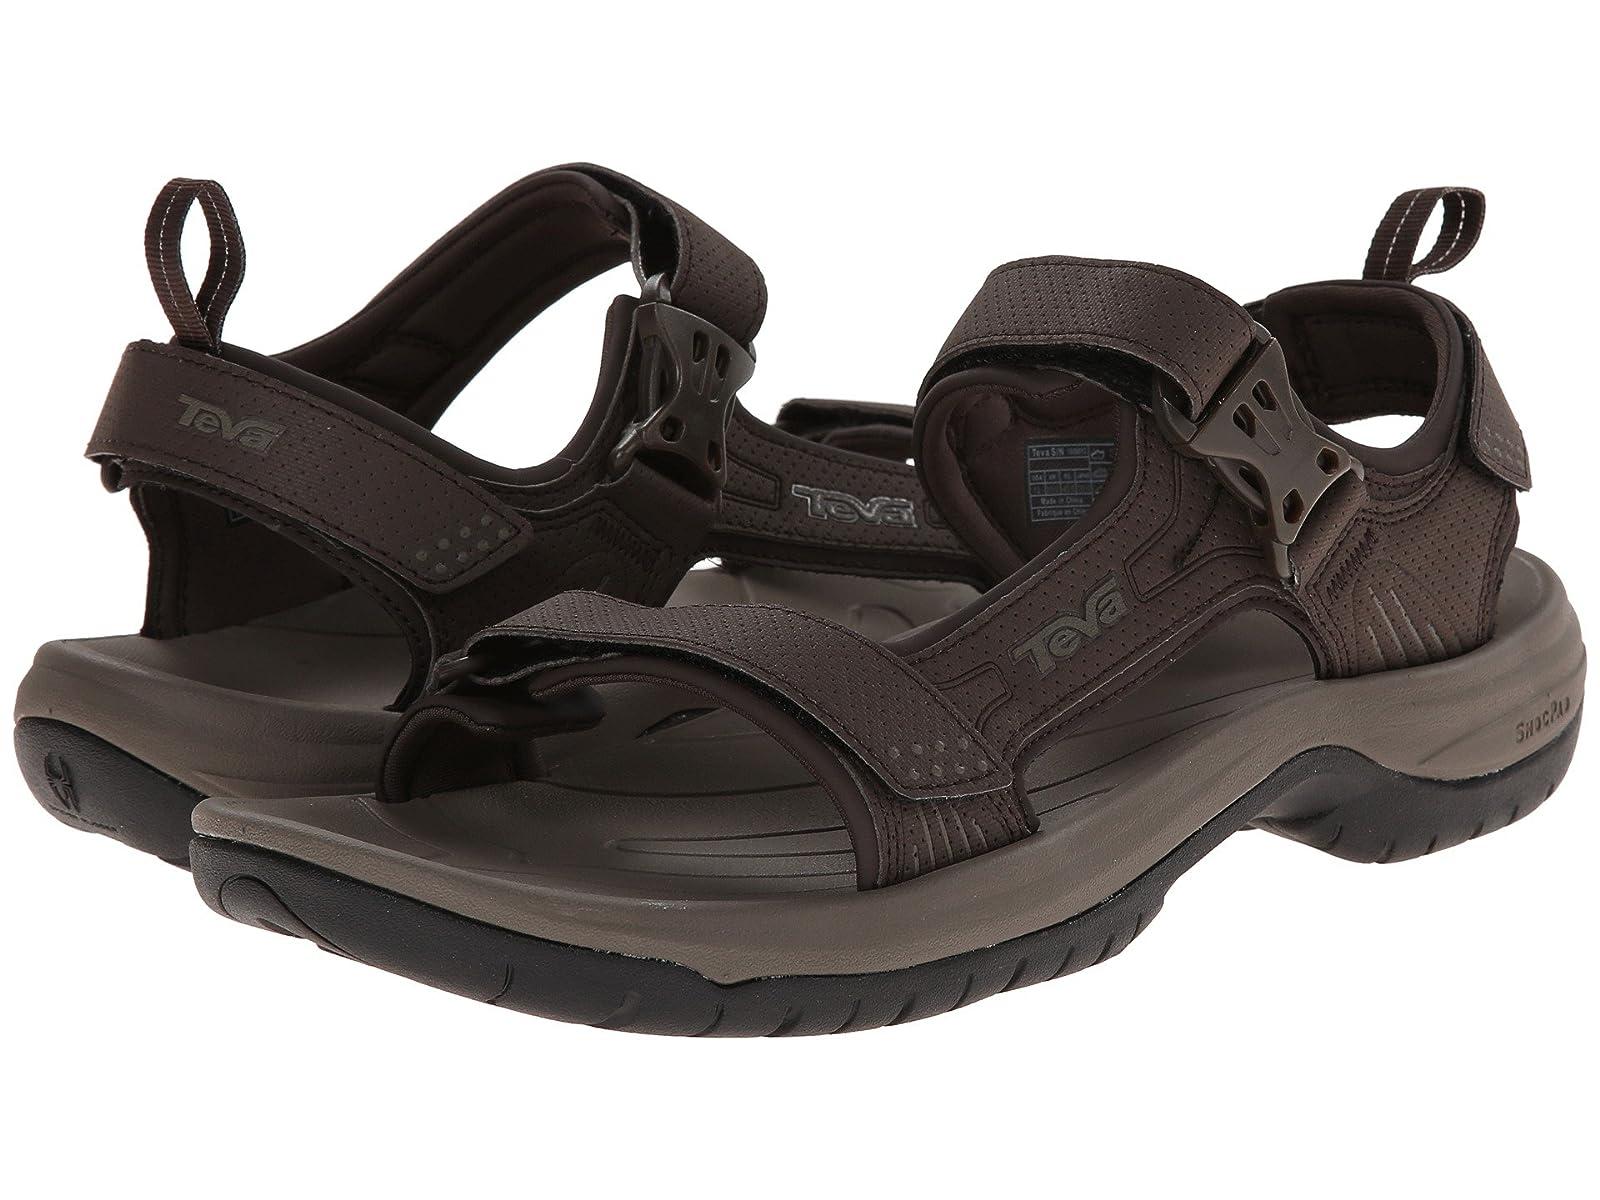 Teva HolliwayAtmospheric grades have affordable shoes